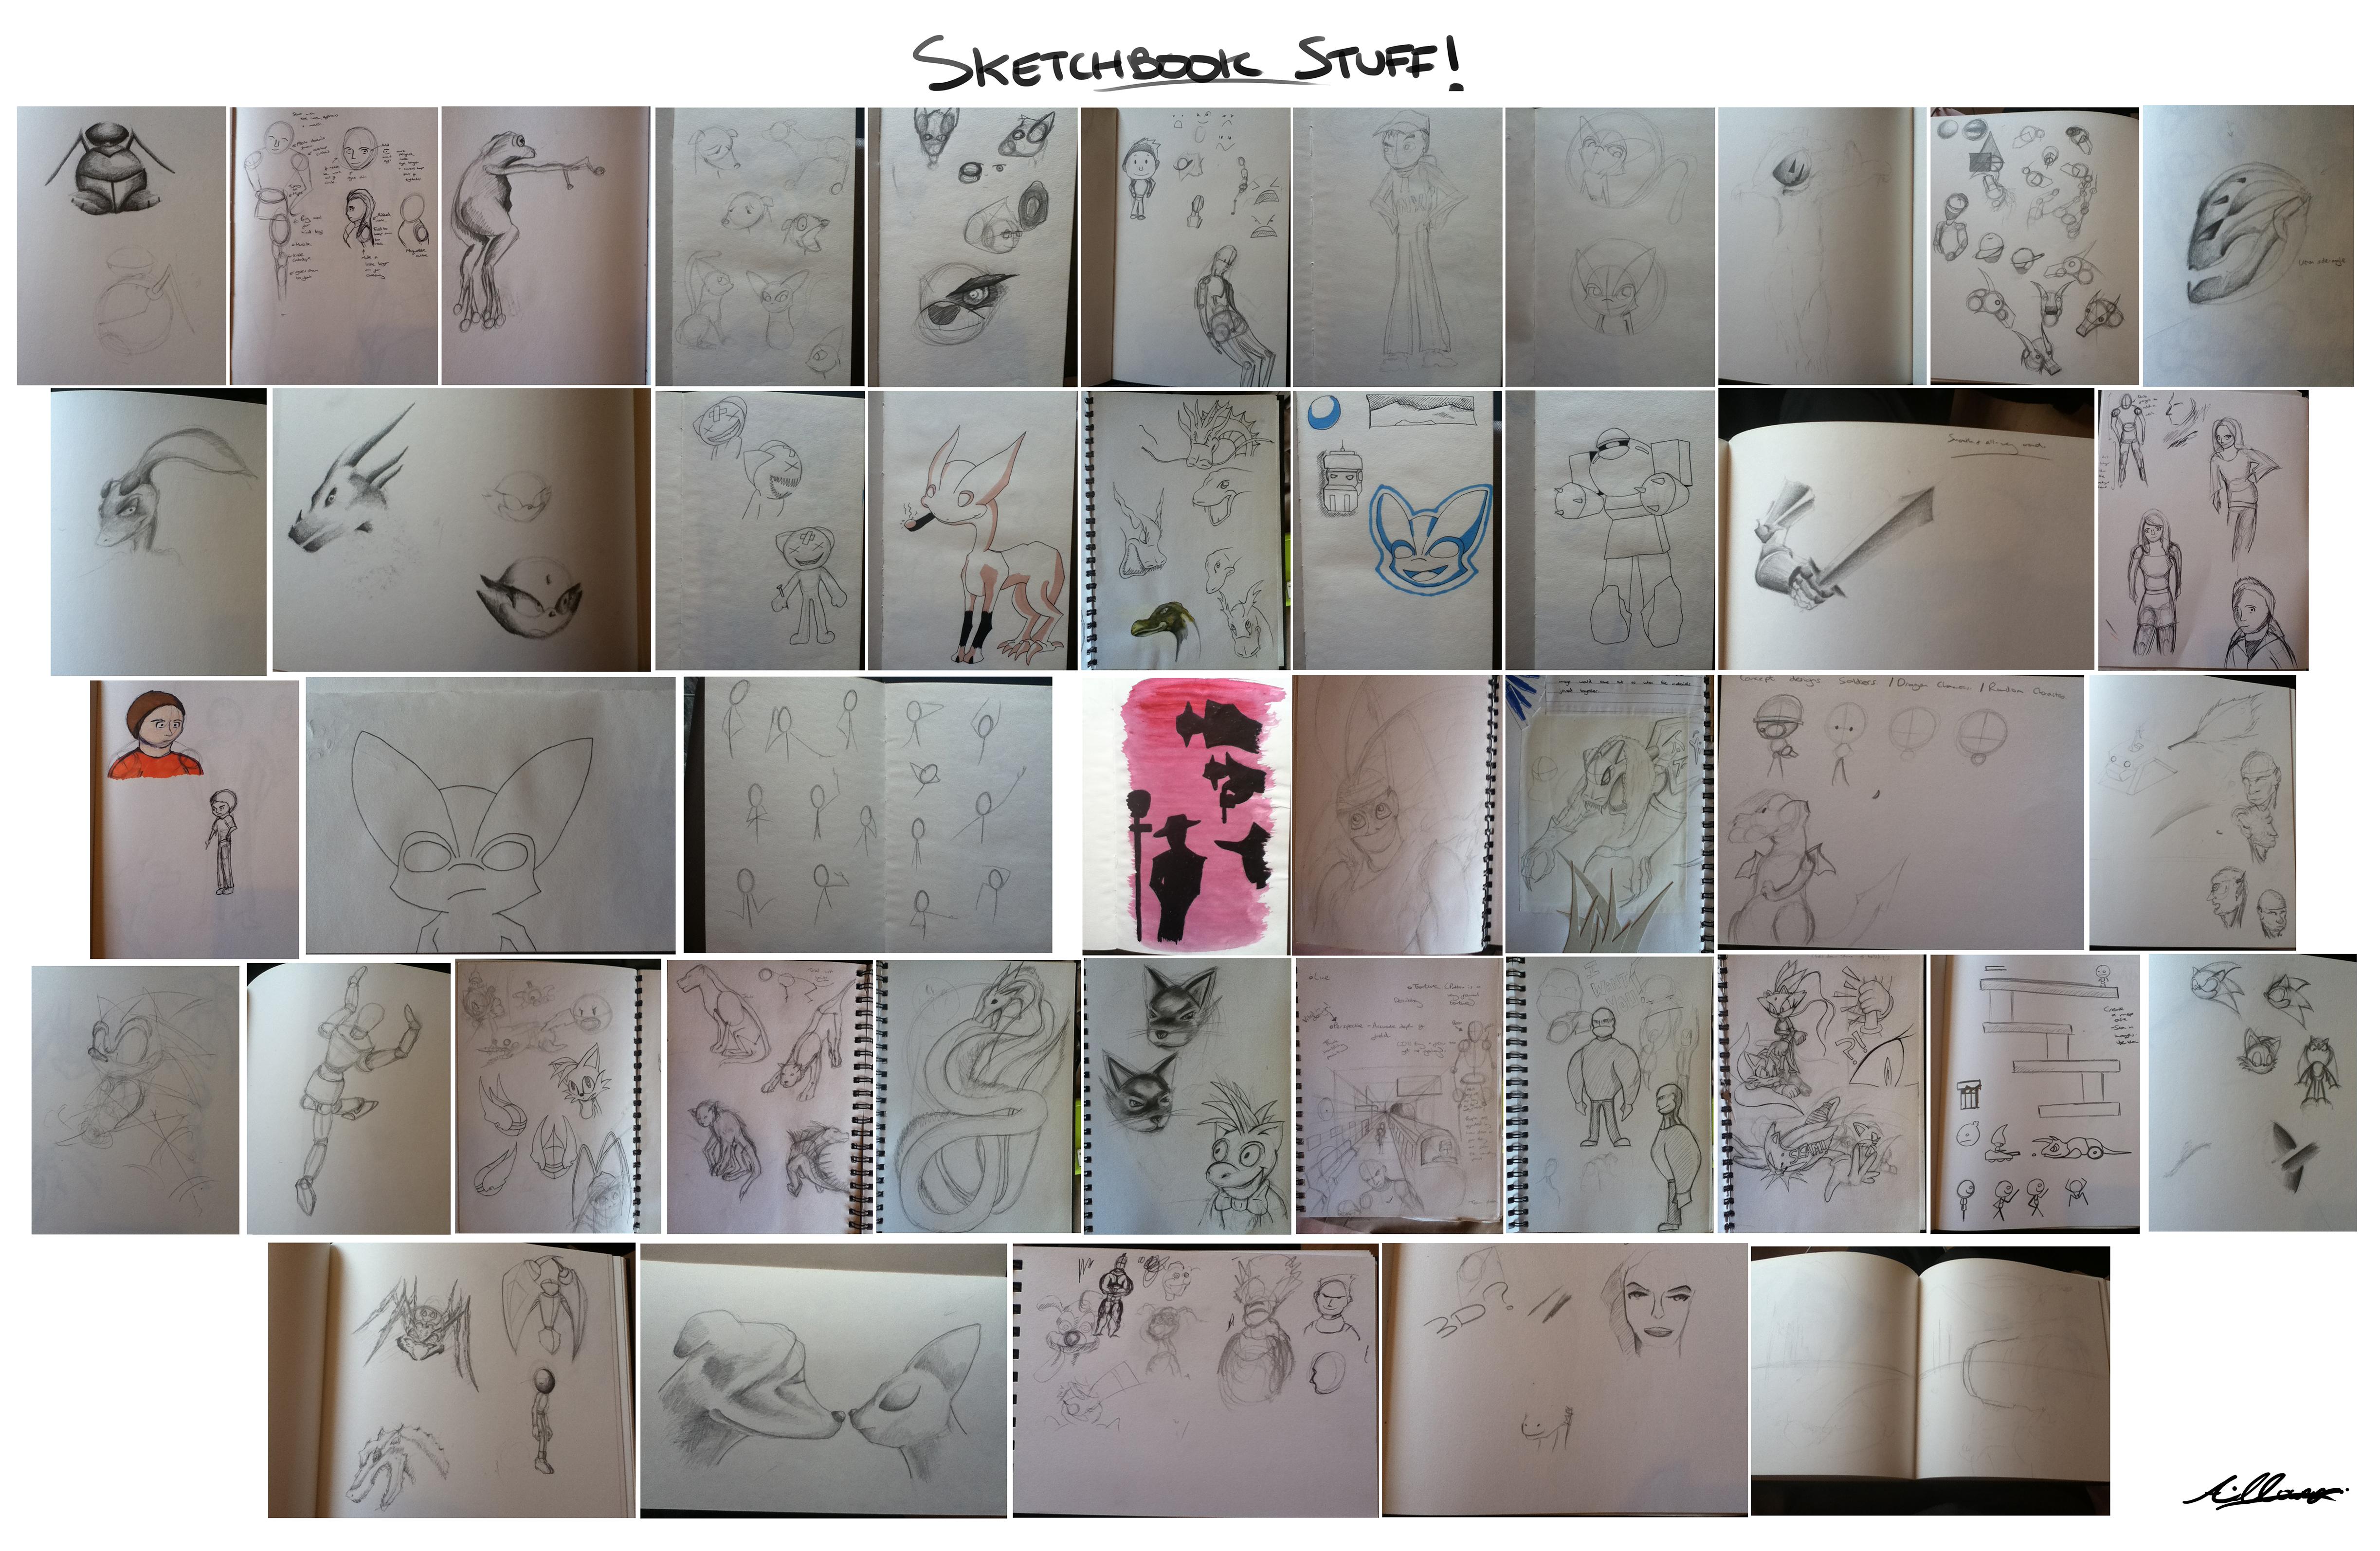 My Sketchbook Stuff by Adam-Clowery